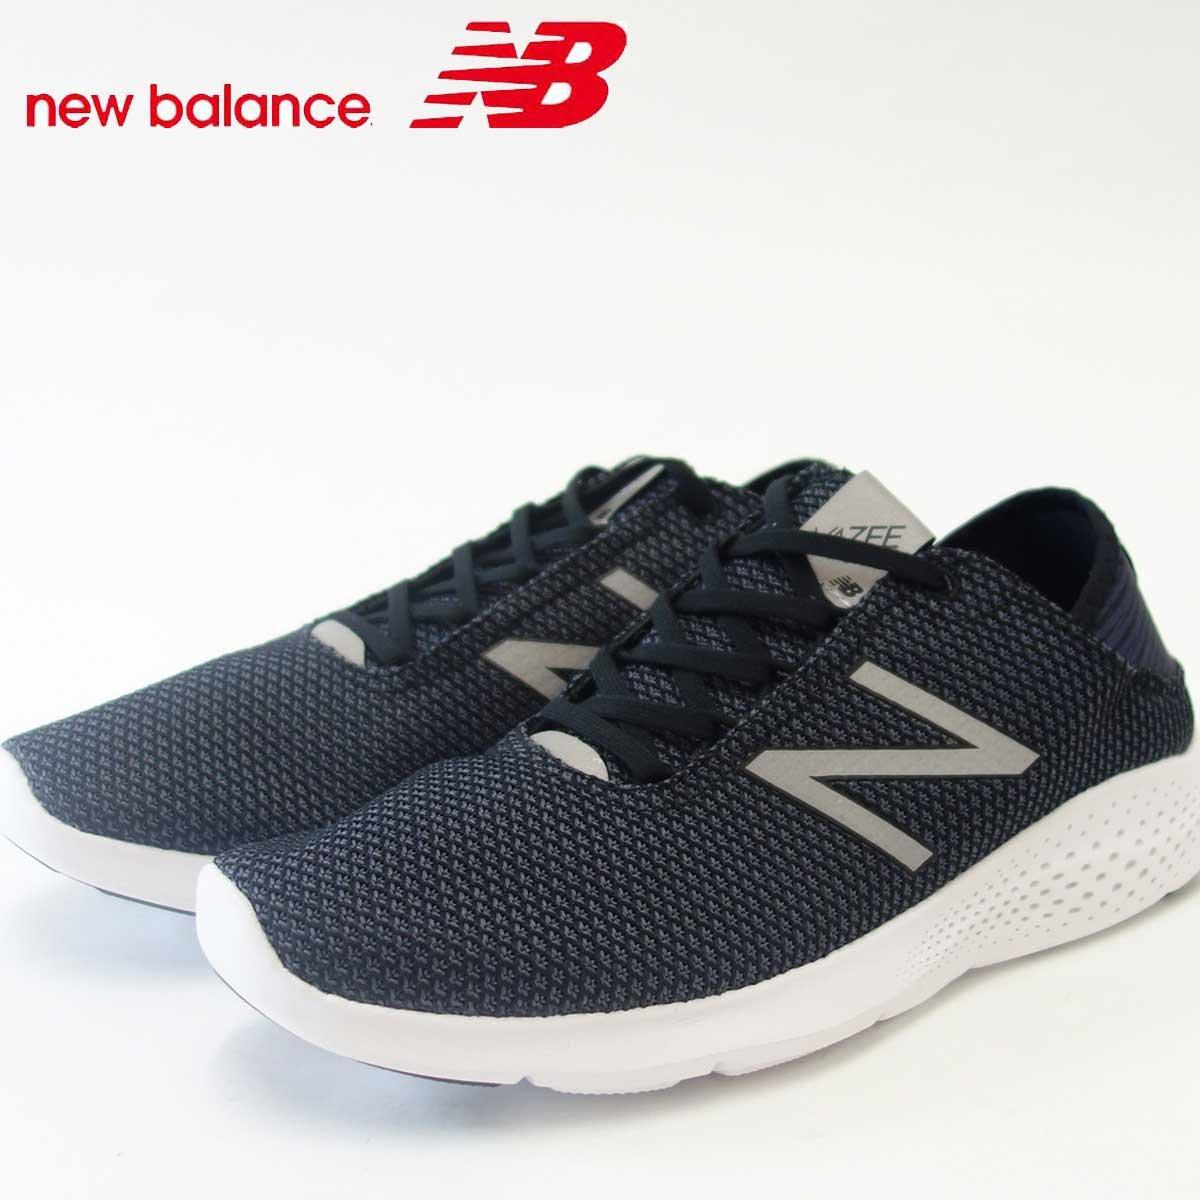 3eae6d8448817 Amazon   【new balance ニューバランス】 VAZEE COAST M ブラック(メンズ)D幅 (10(28cm))   ランニング